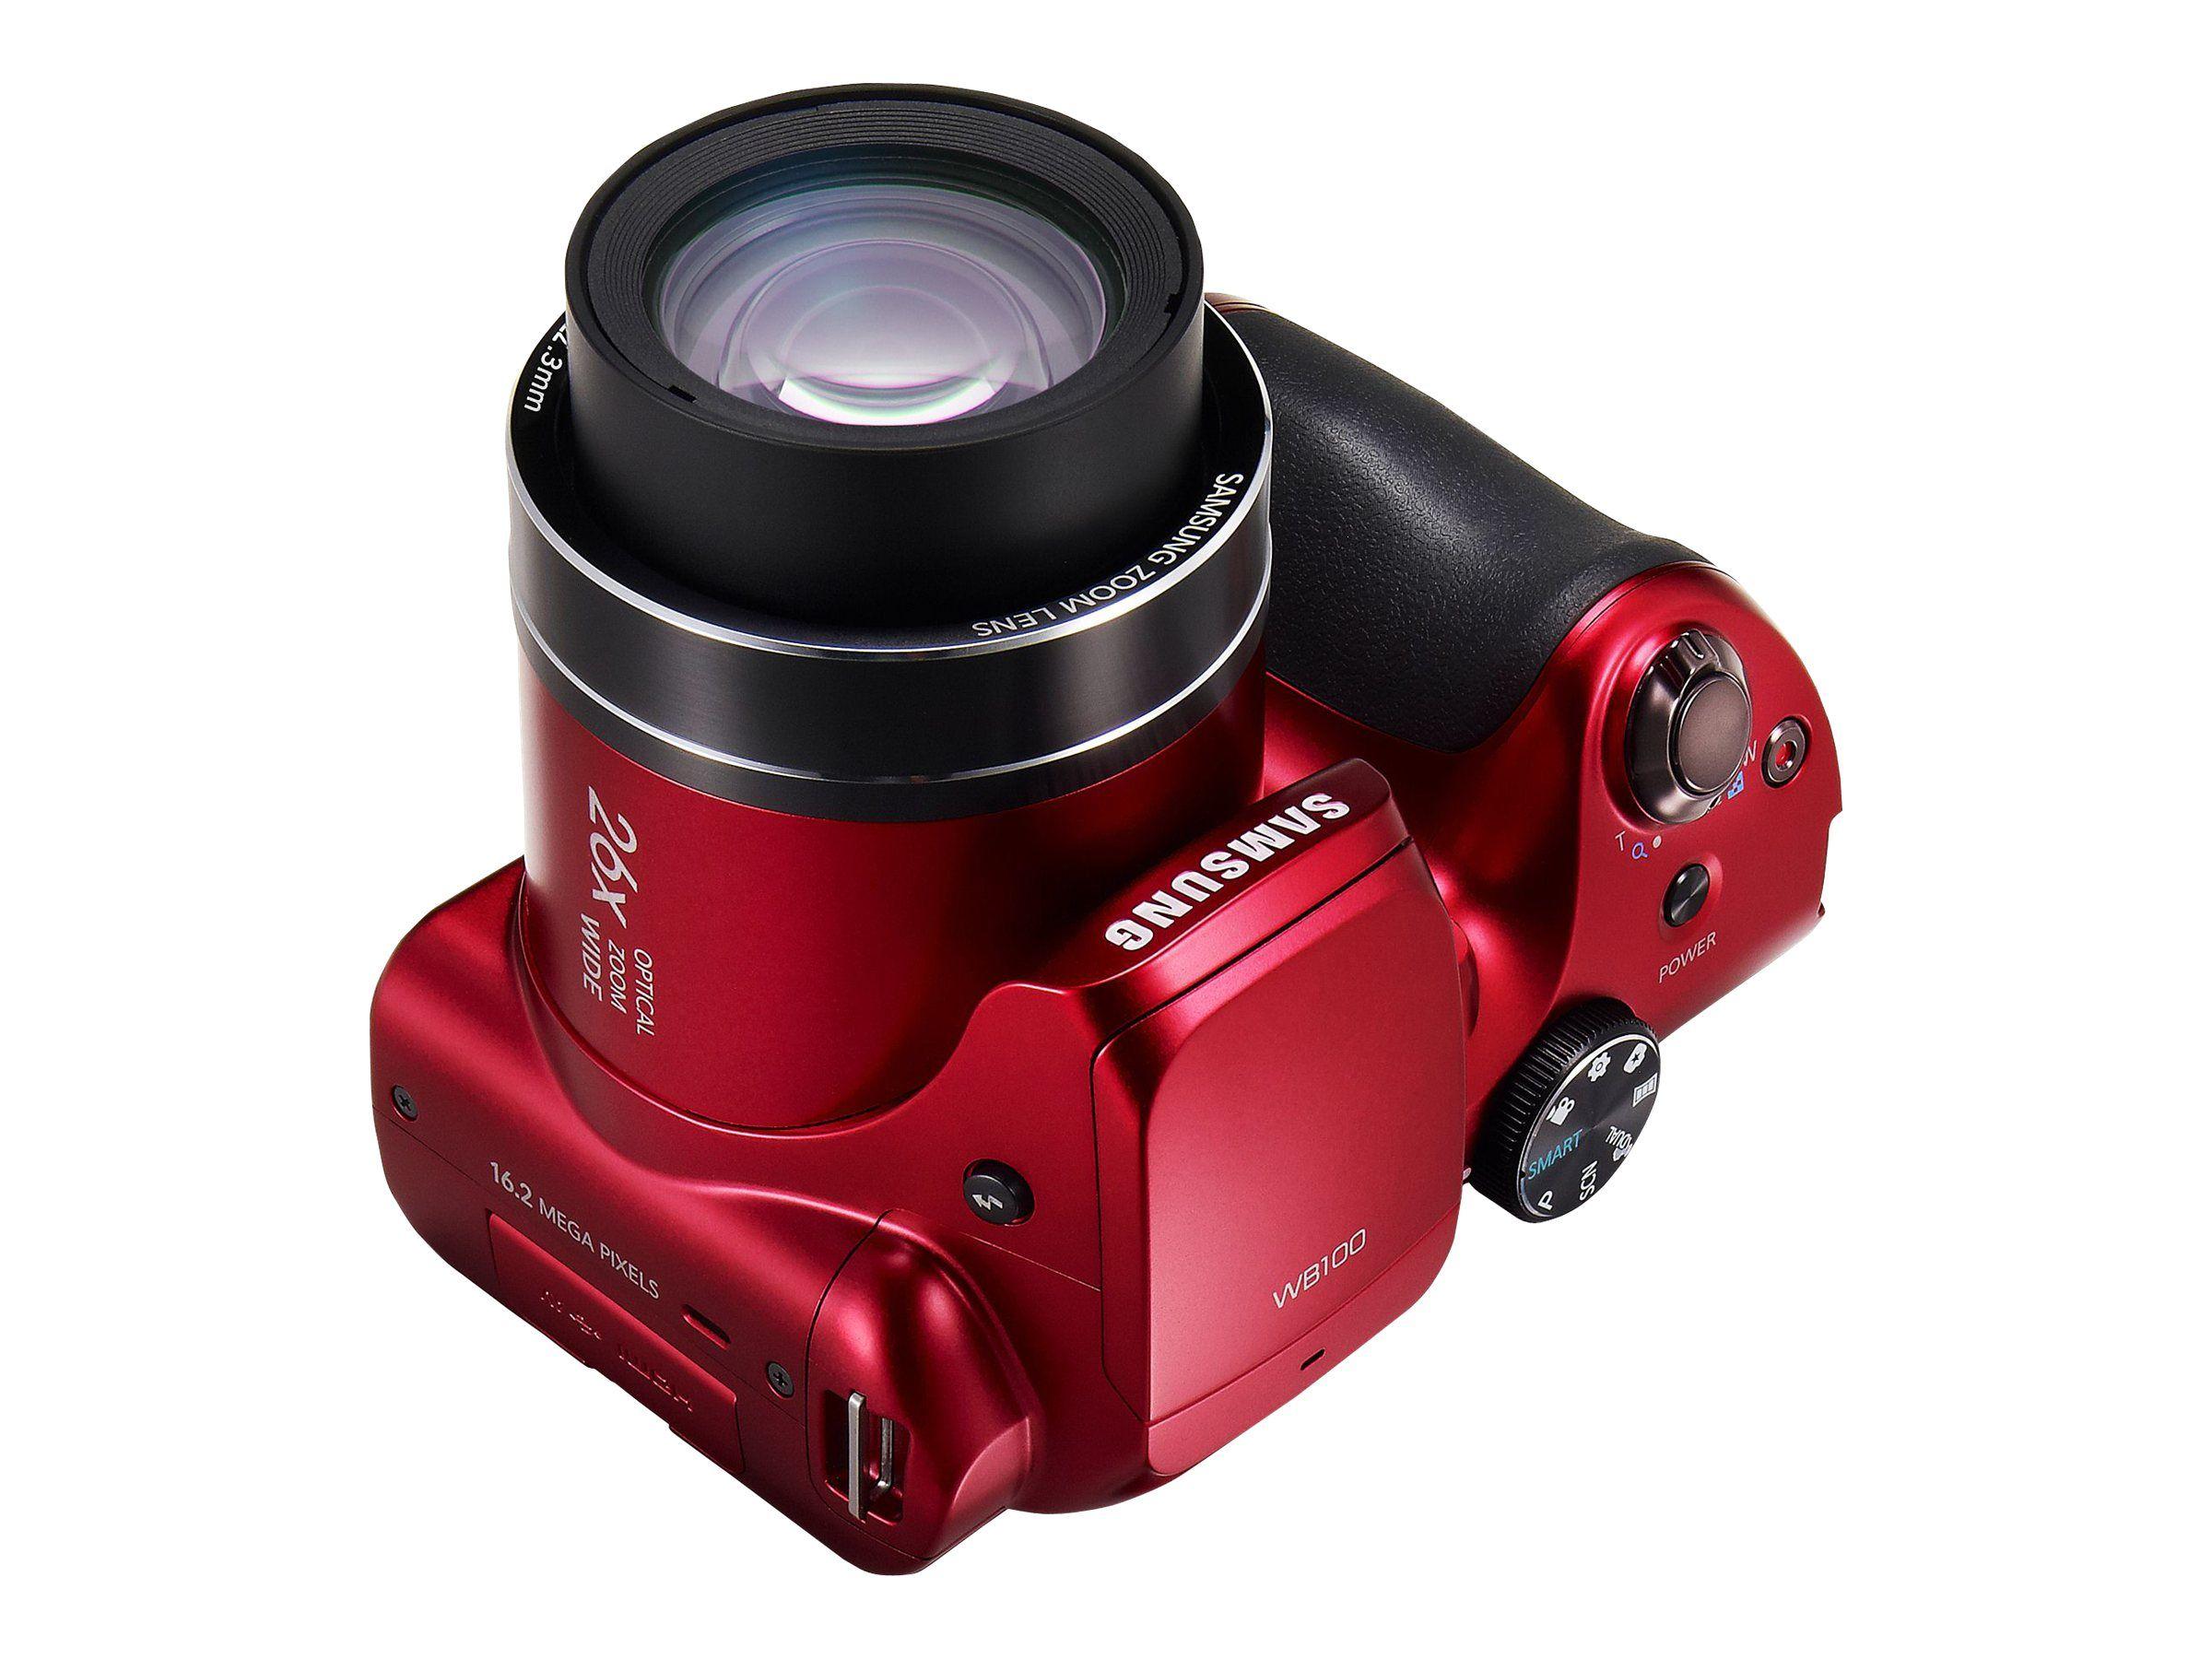 SAMSUNG Digital Camera WB100